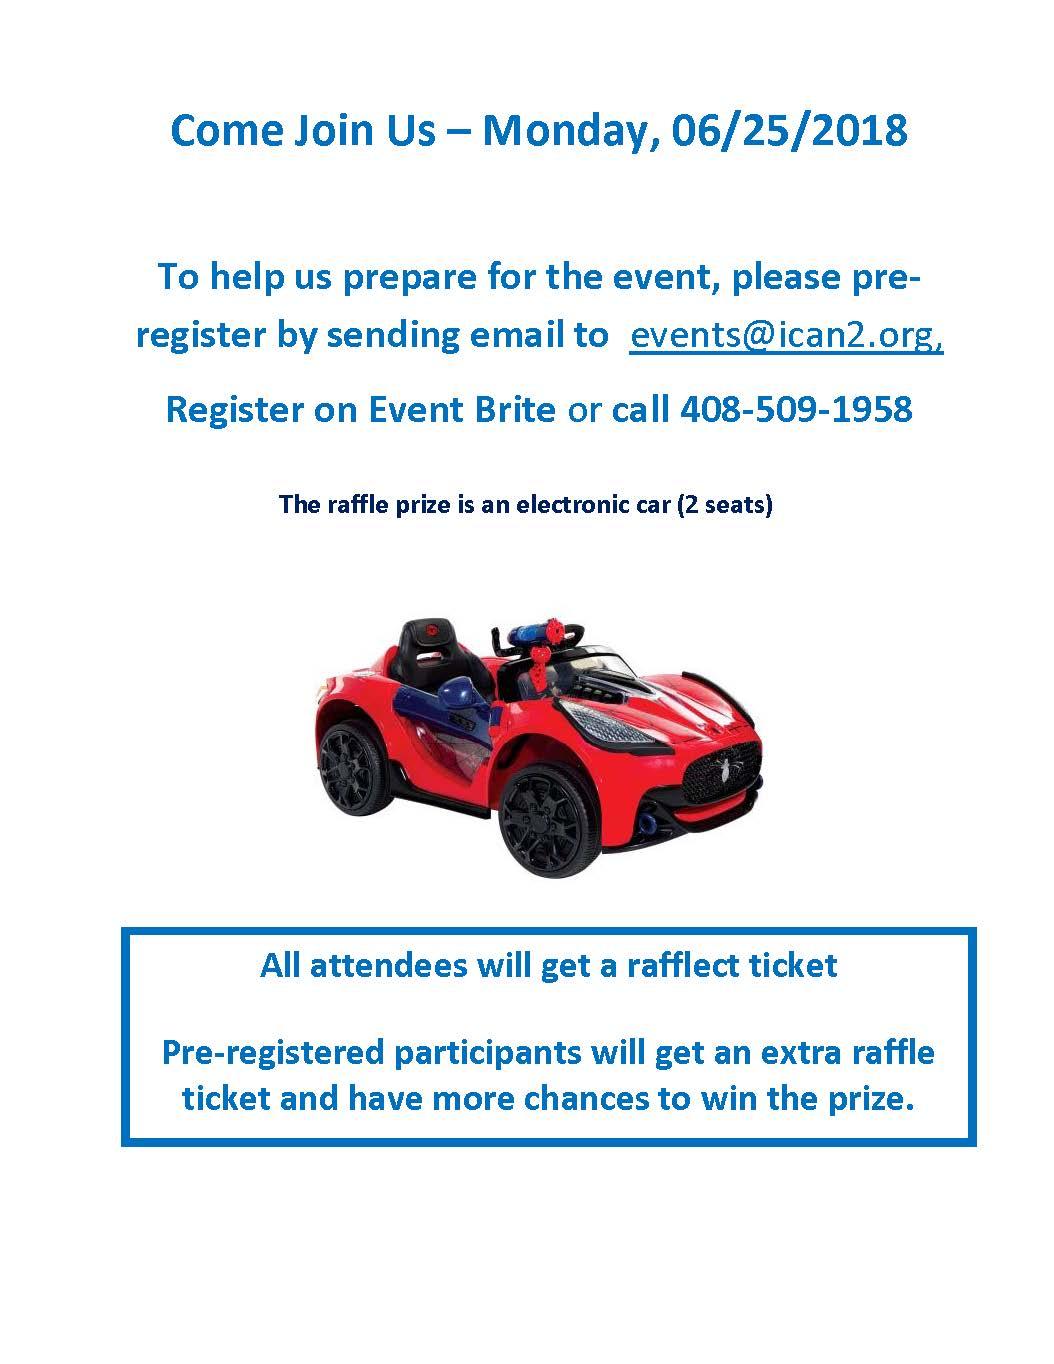 Electric Car - Raffle prize